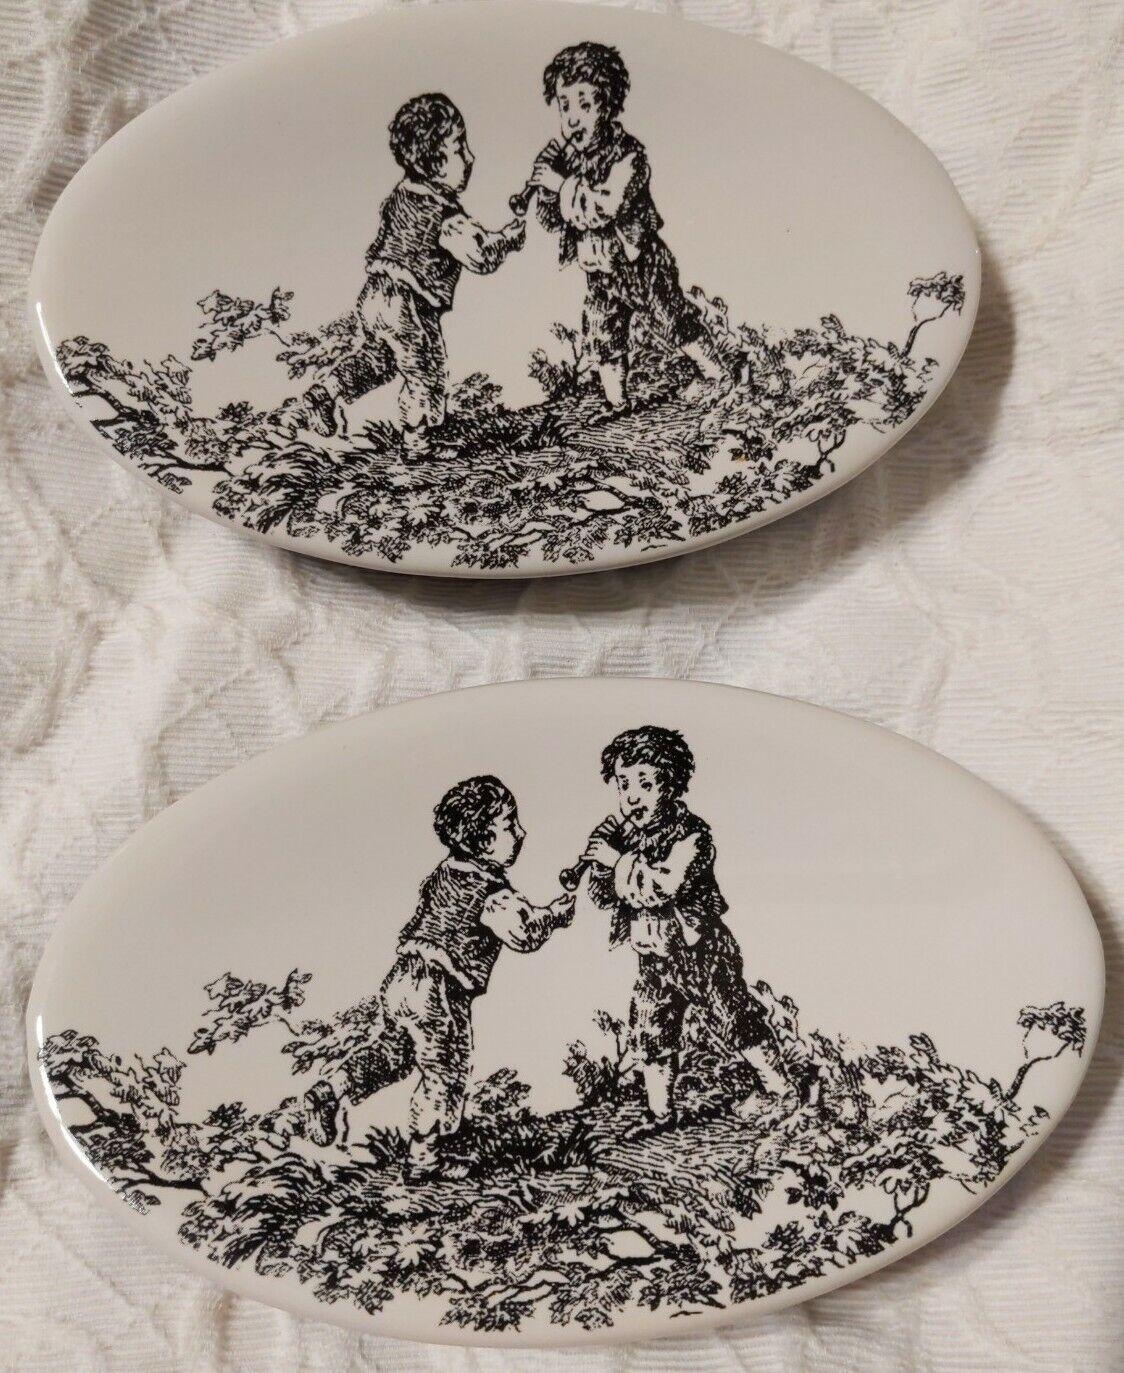 Waverly Black White Ceramic Soap Dish (2) Boys Playing Flute Checkered